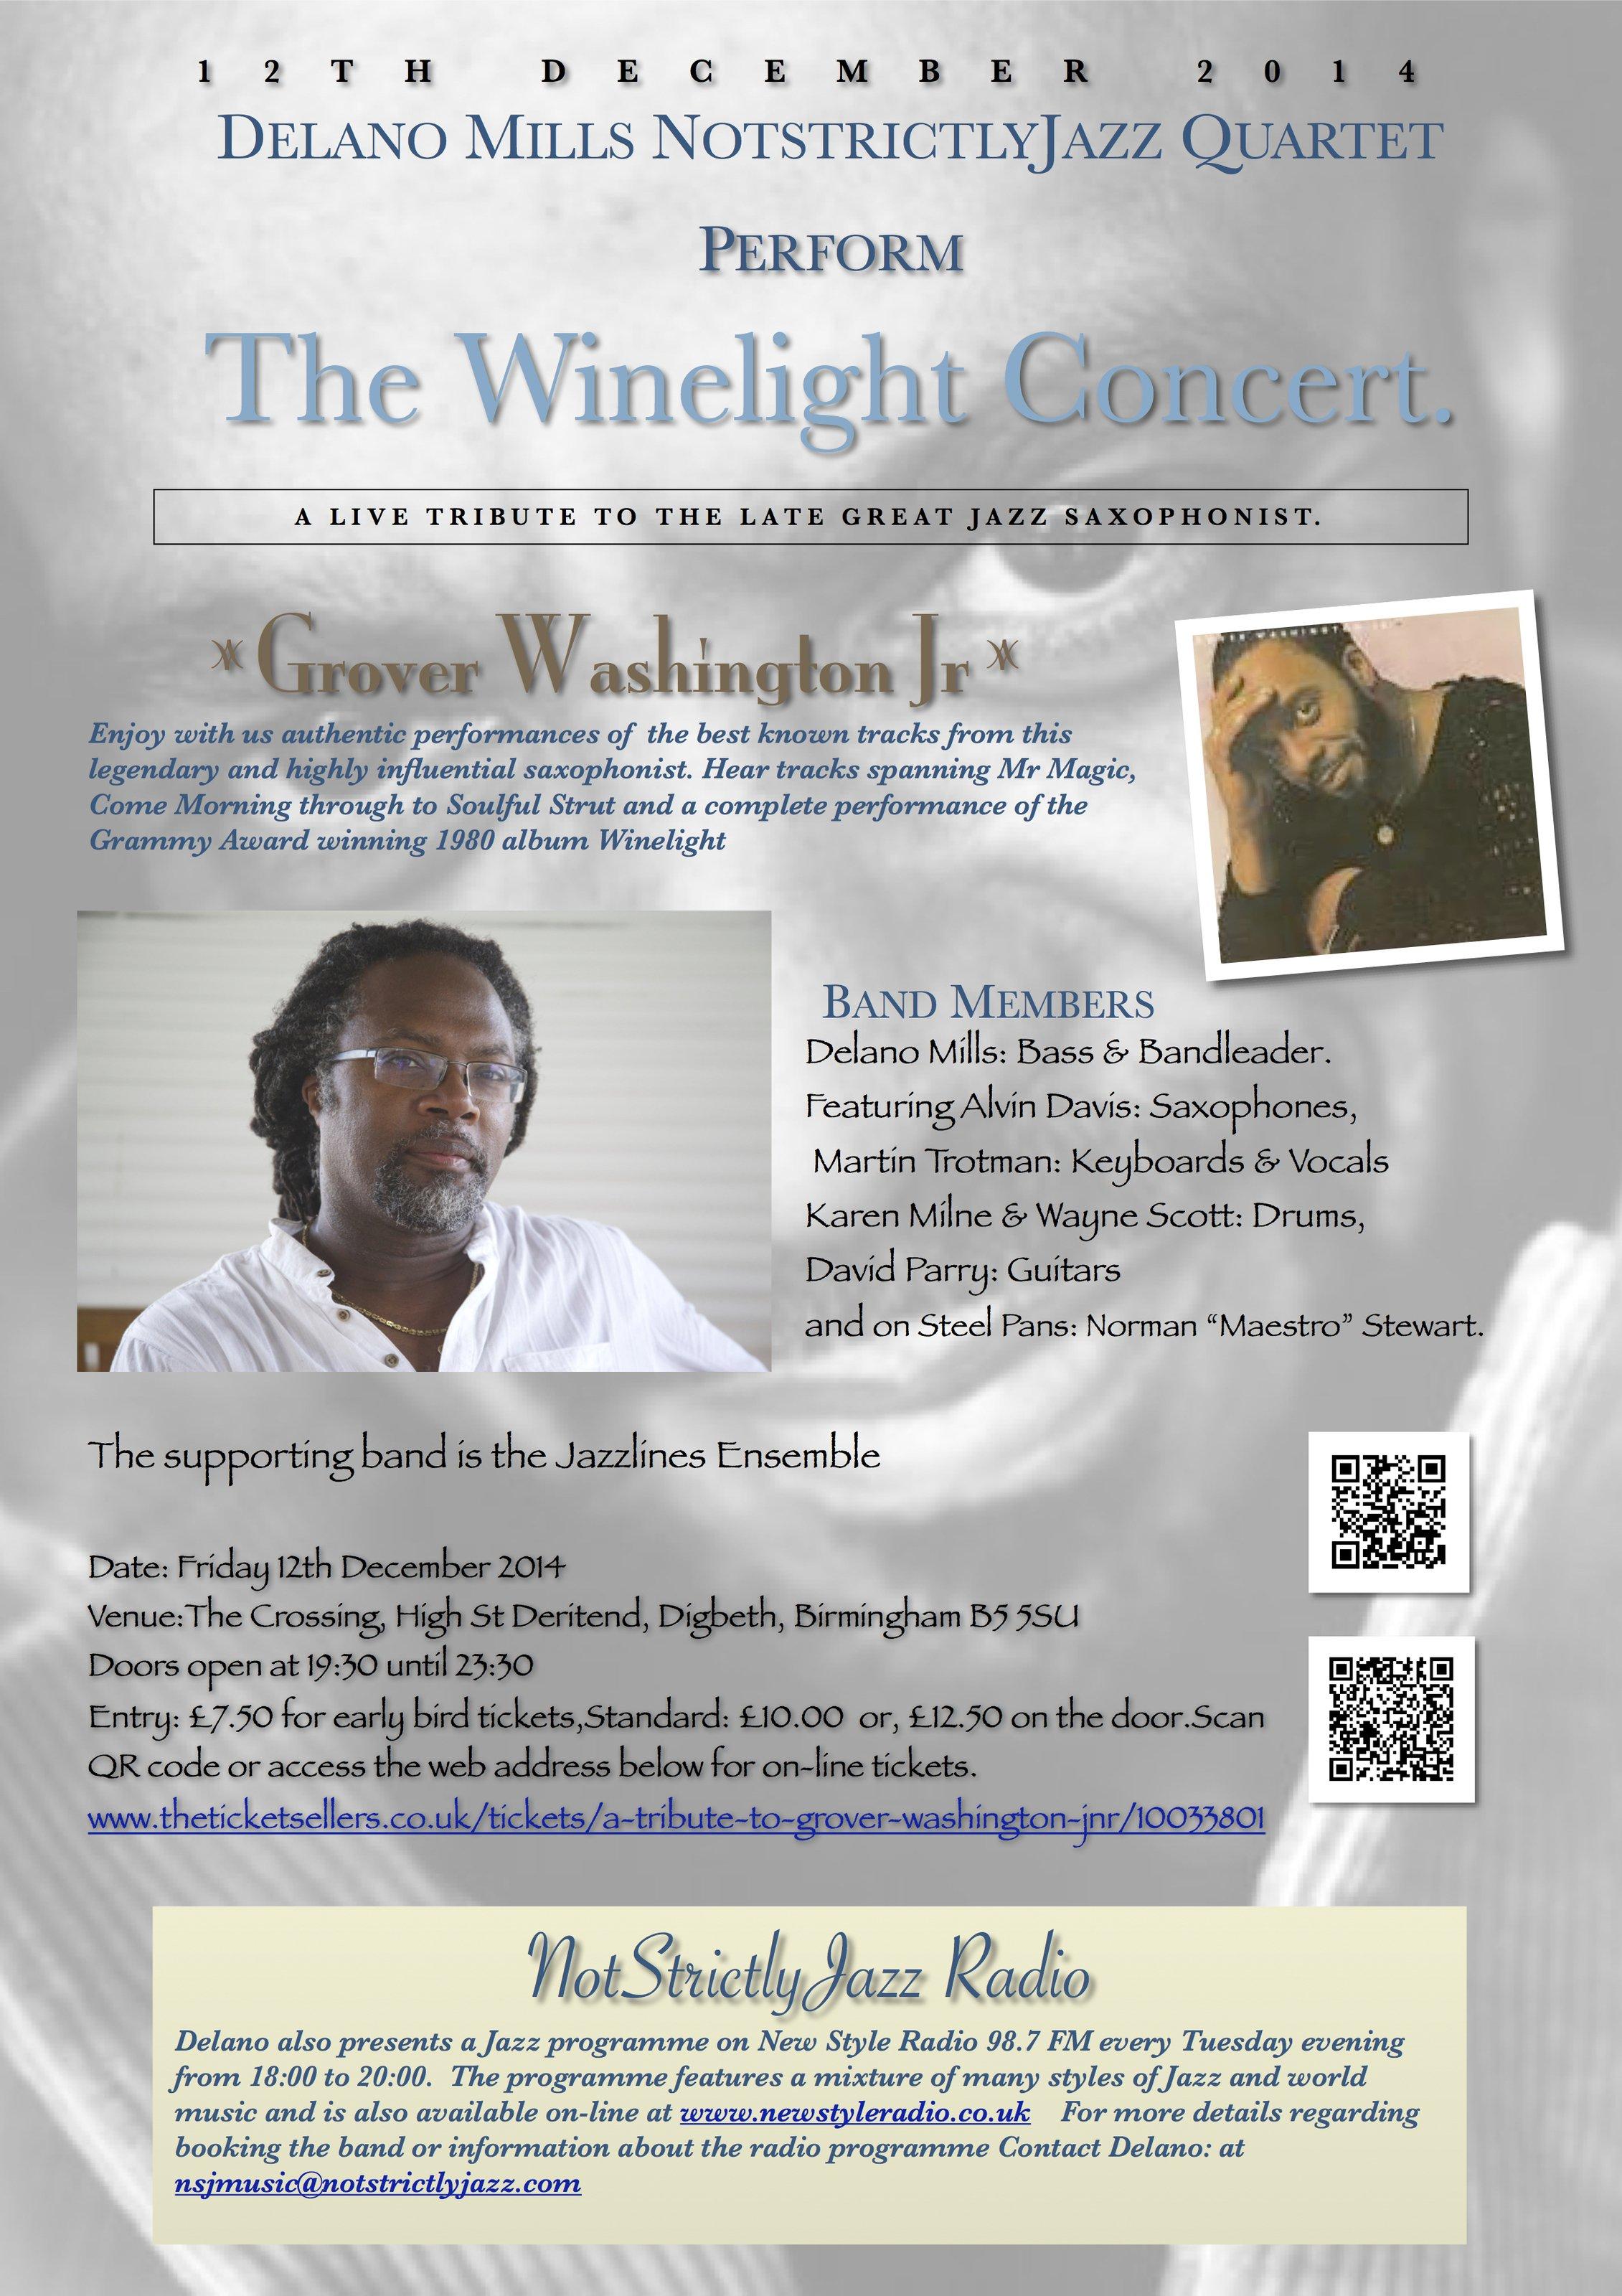 Winelight Grover Washington Jr Tribute Reverbnation